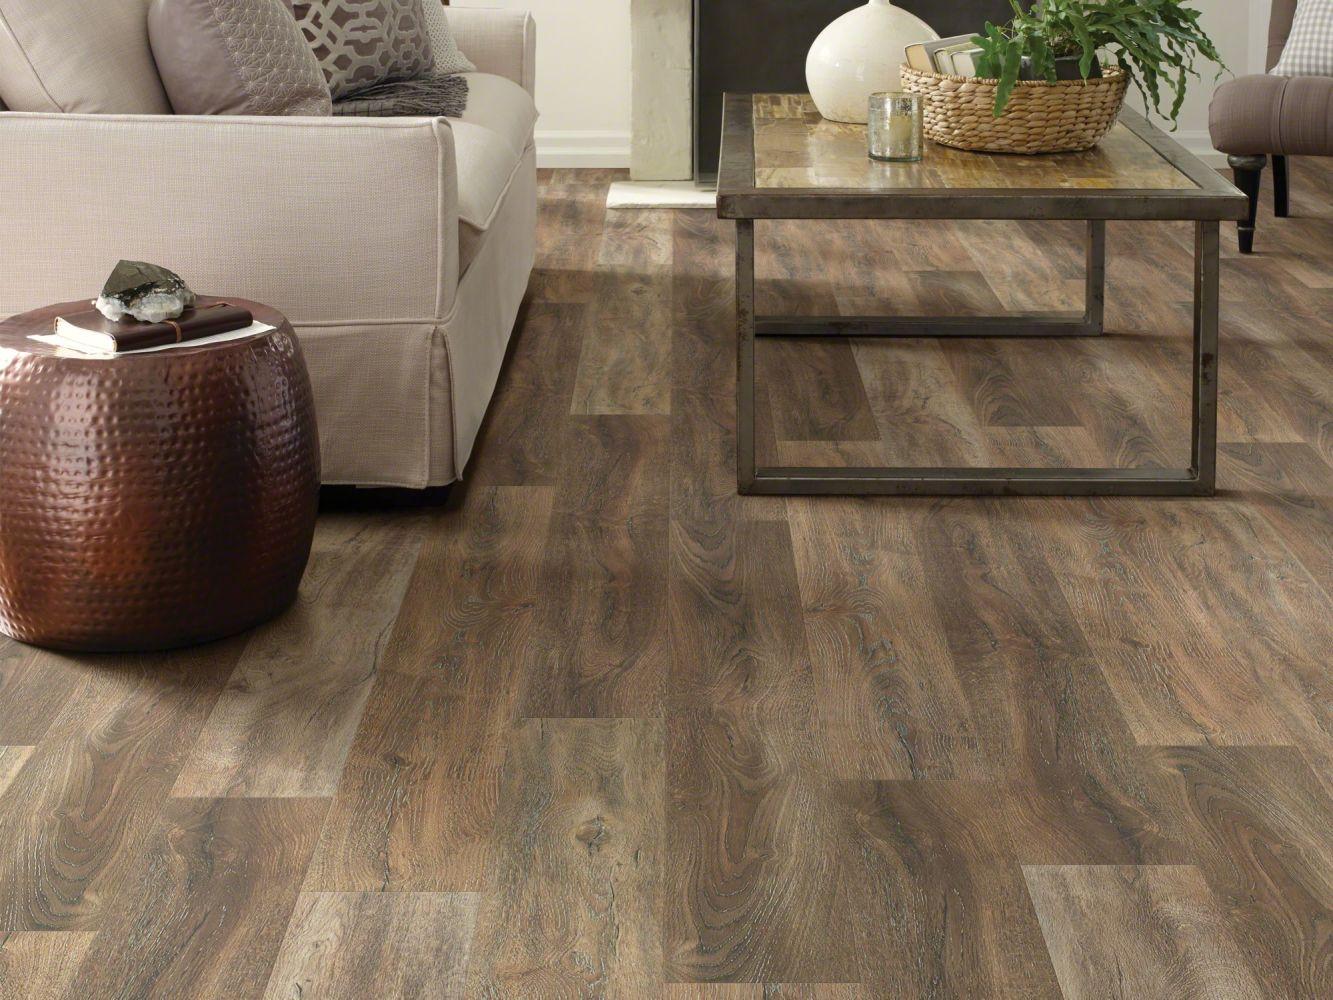 Shaw Floors Resilient Residential Mountainside HD Bridger 00813_VH549